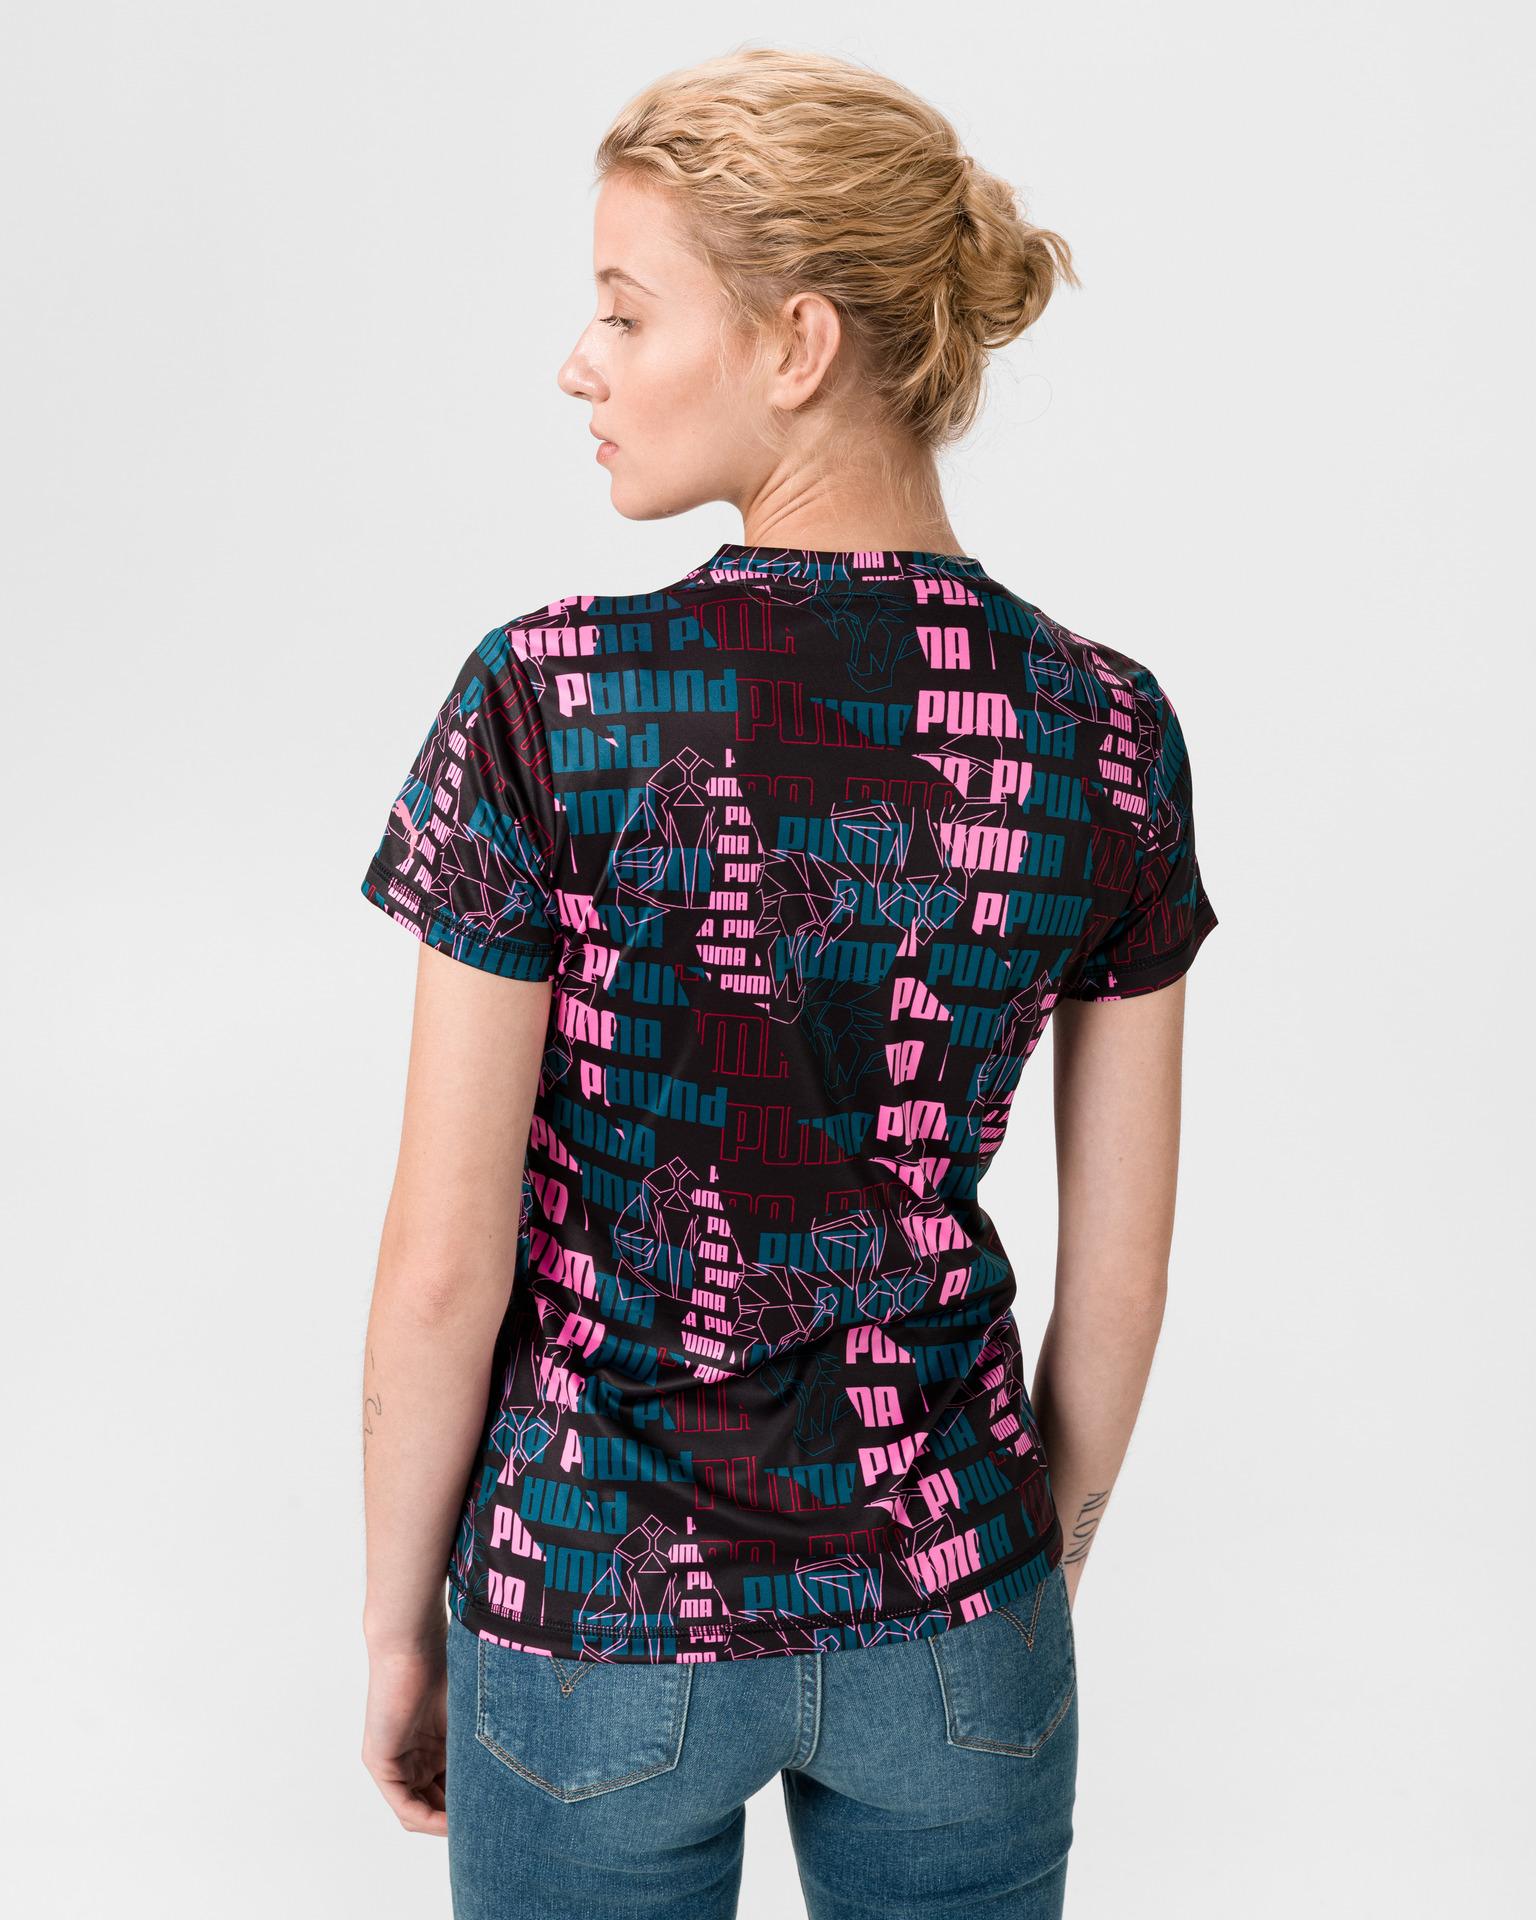 Puma Performance AOP T-shirt Black